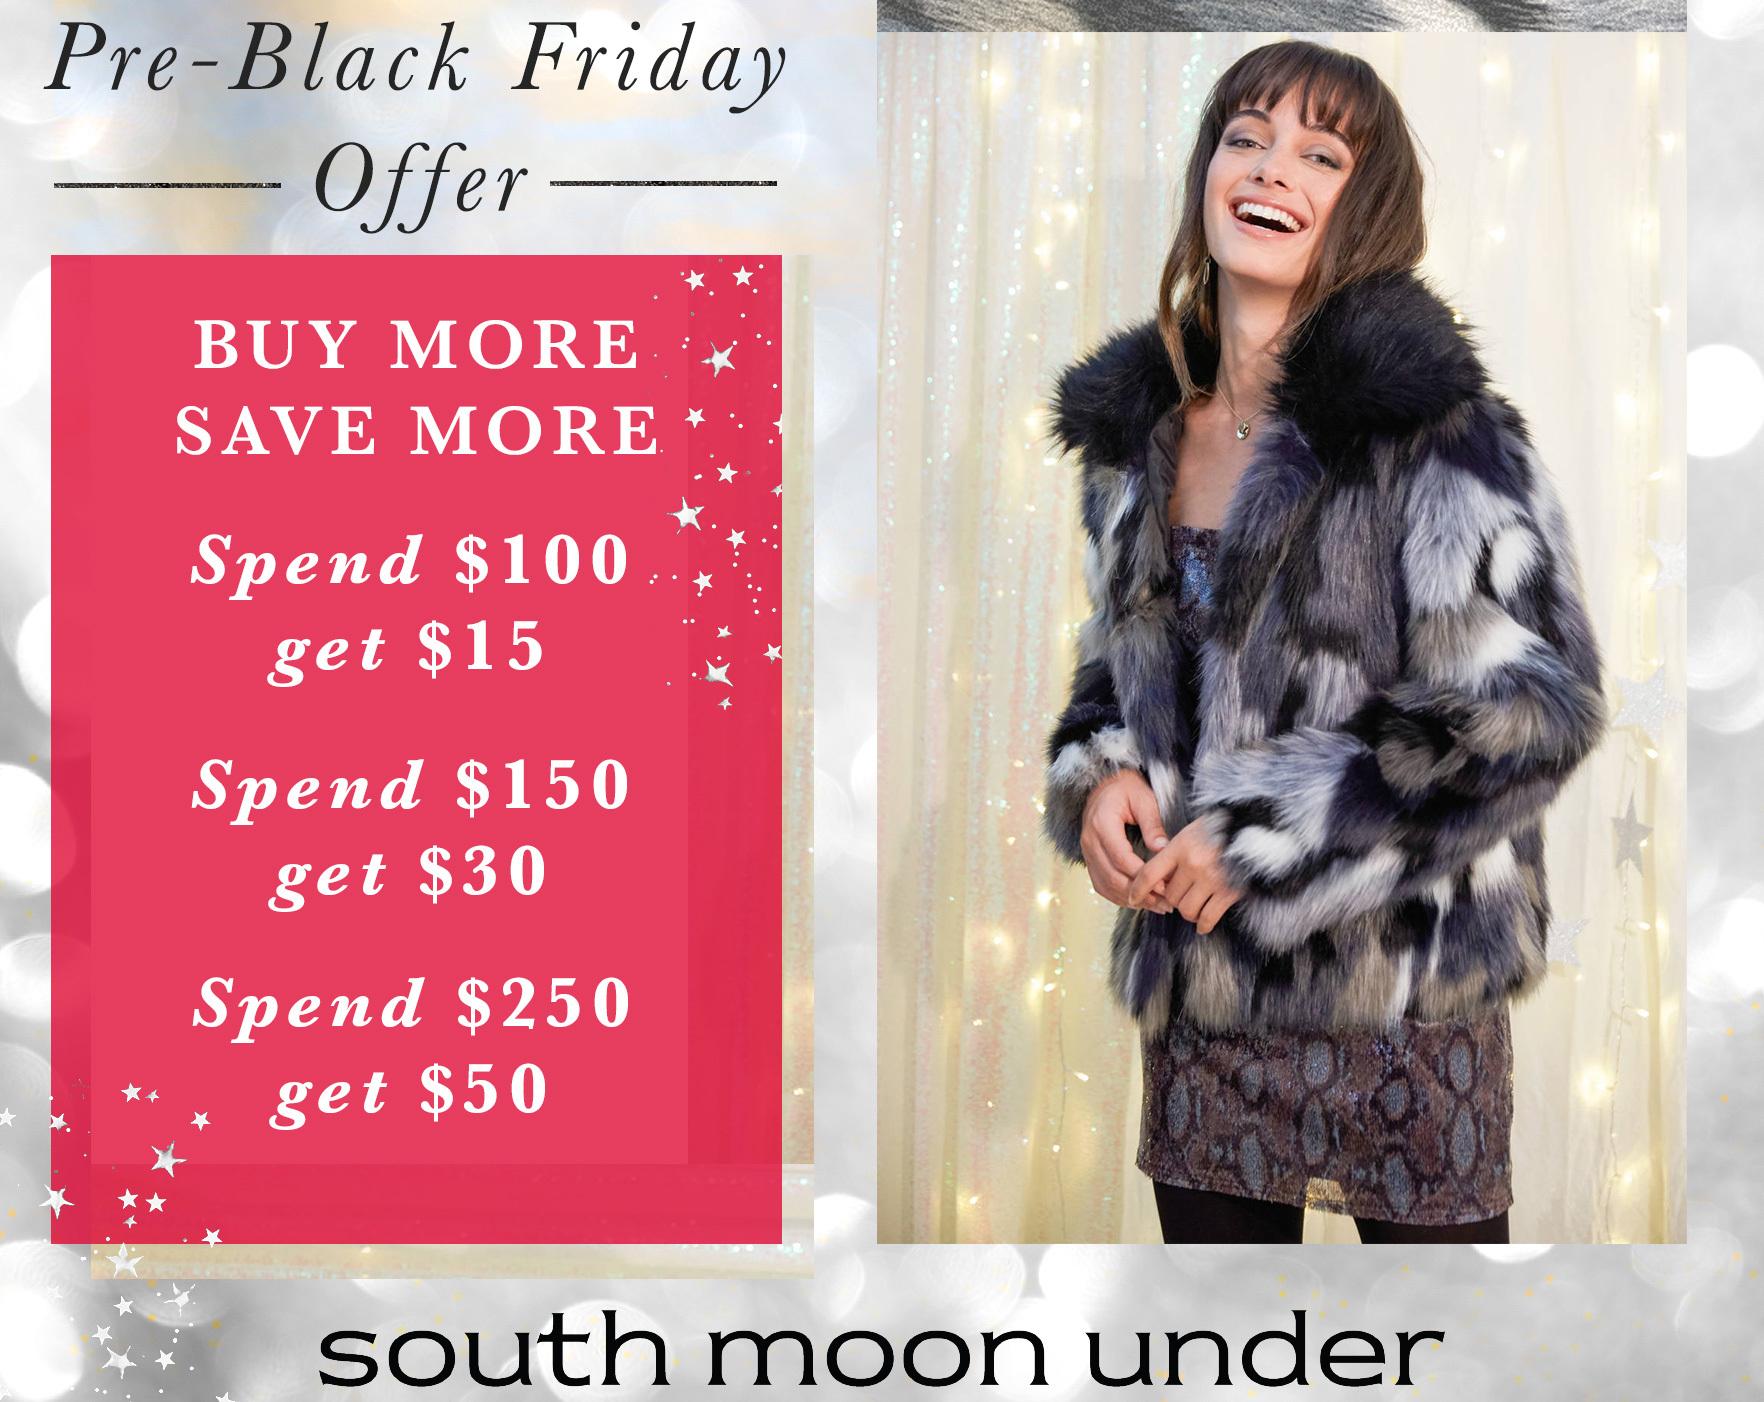 South Moon Under Black Friday 2020 Ad